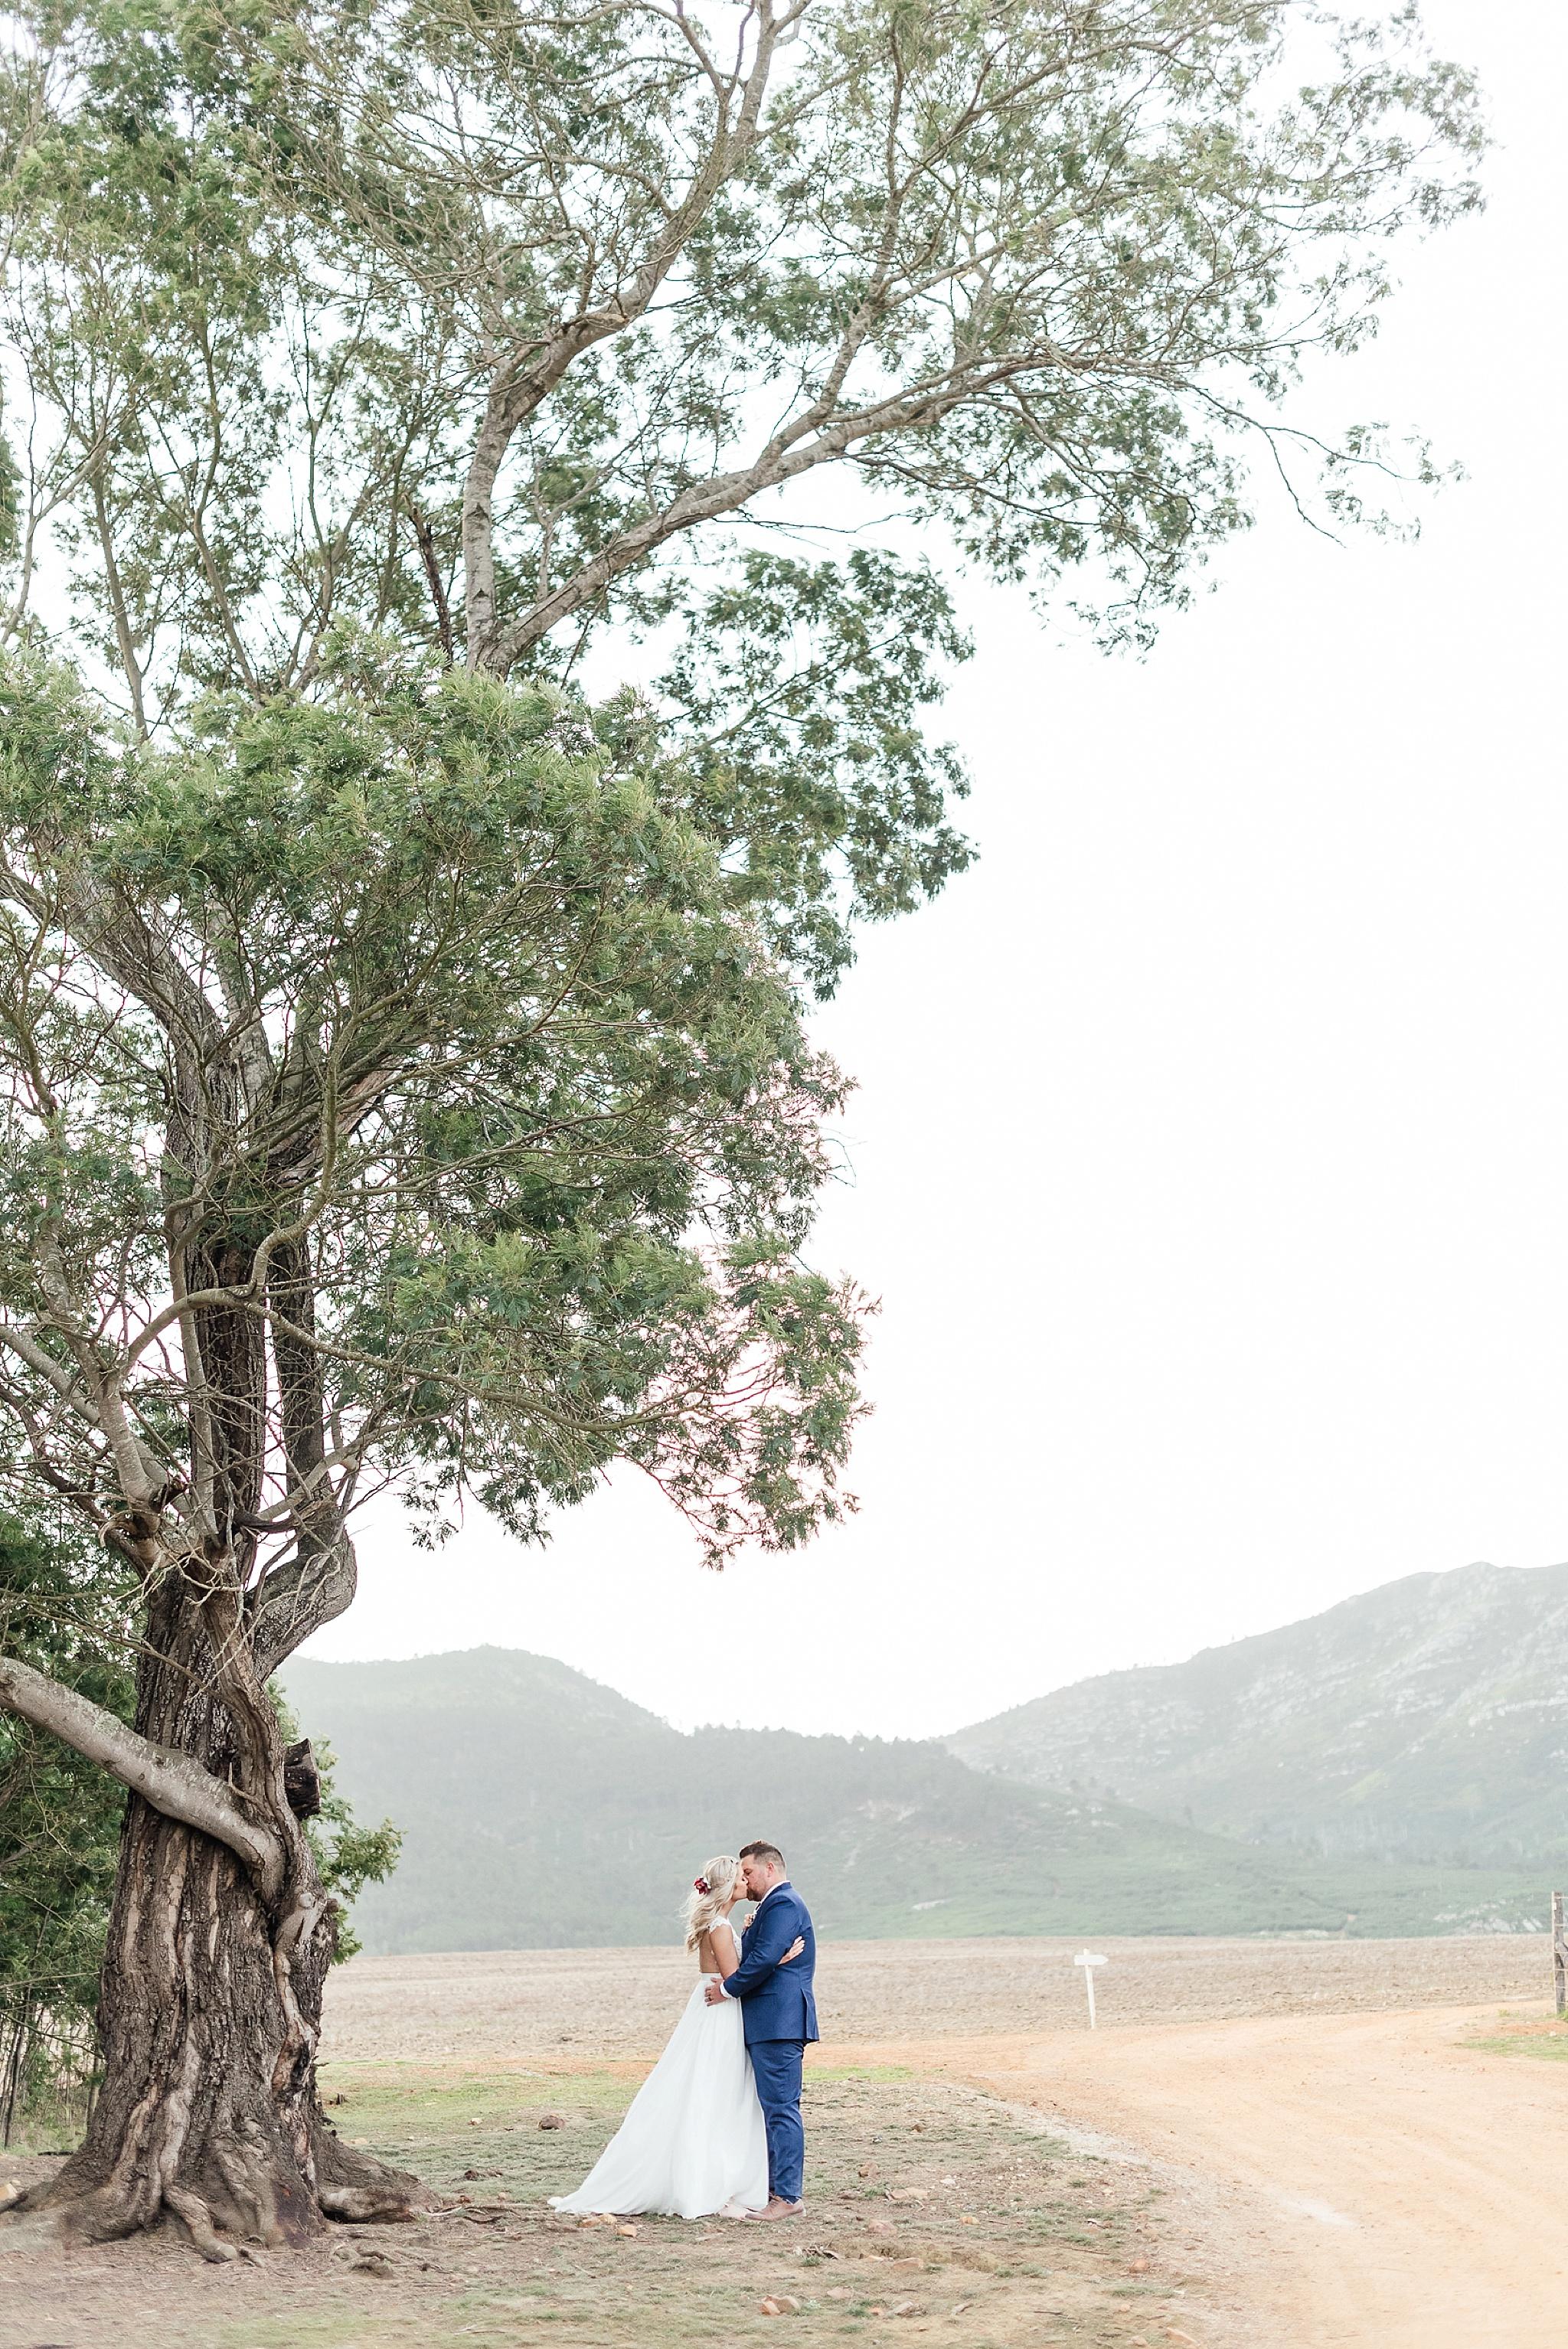 Cape Town Photographer Darren Bester - Die Woud Wedding - Gareth & Roxanne_0032.jpg